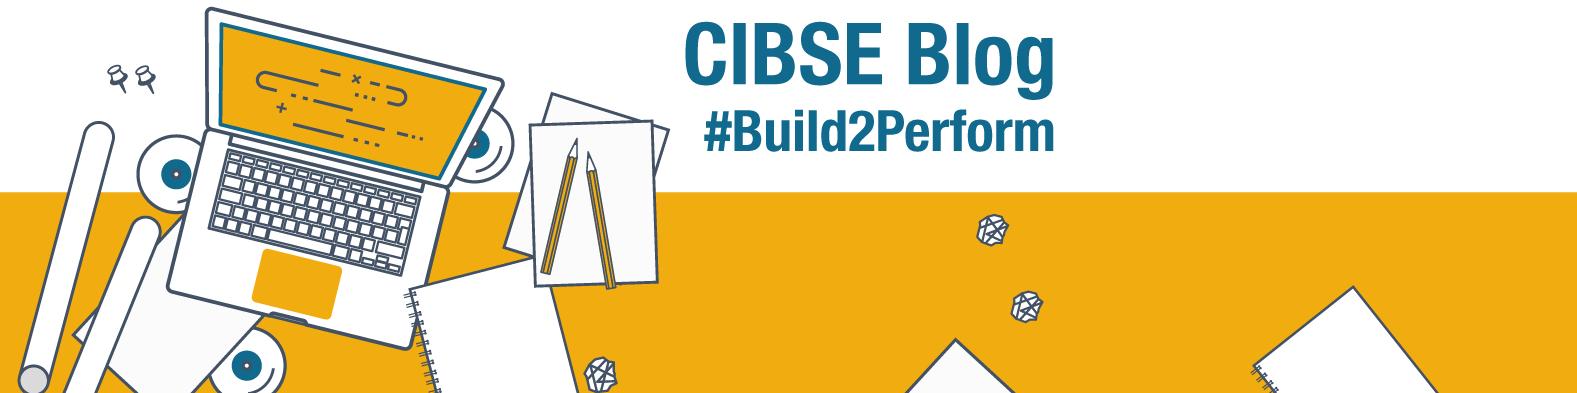 CIBSE Blog